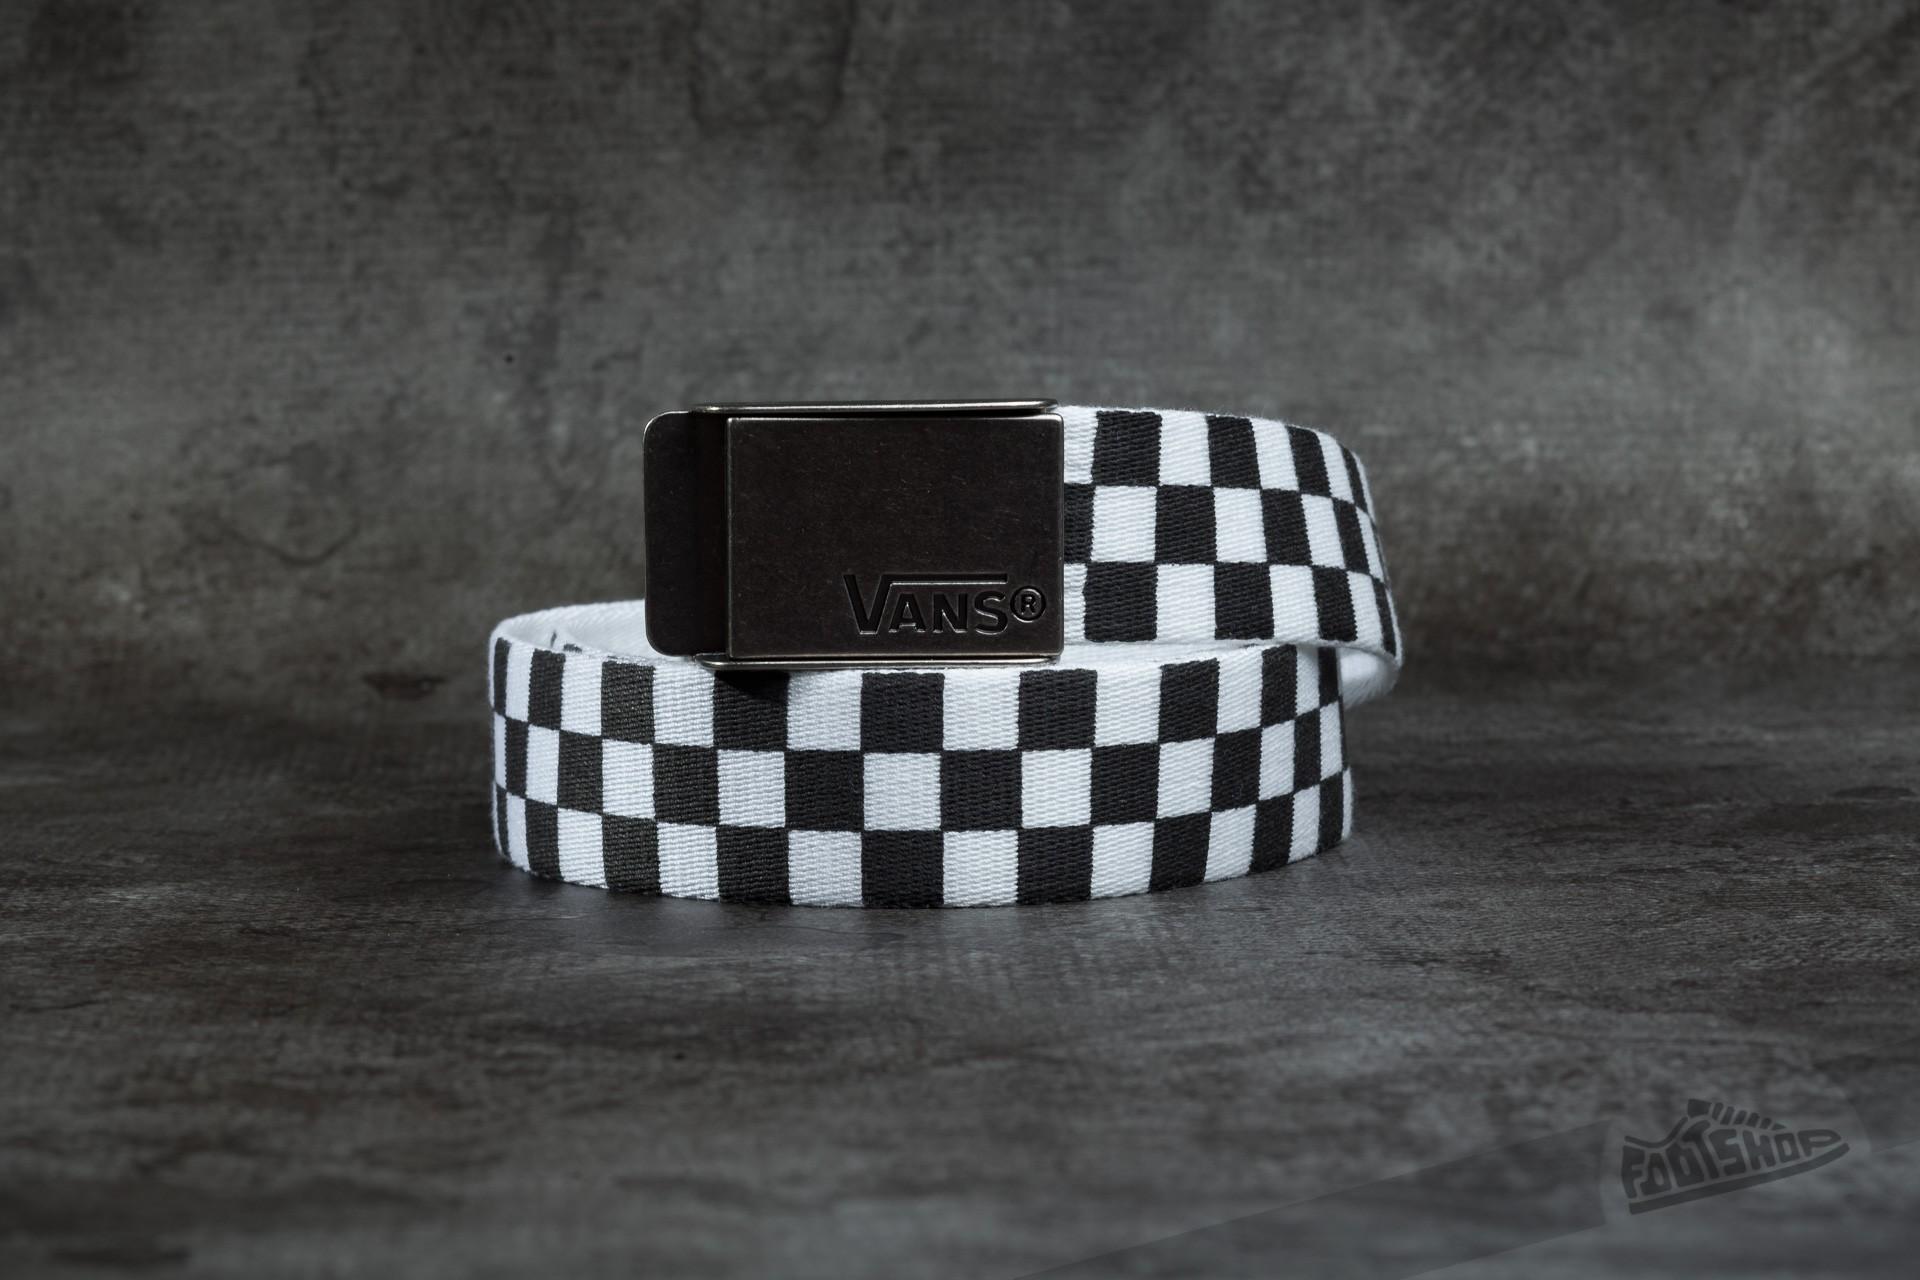 aac14c528b Vans Deppster Web Belt Black White